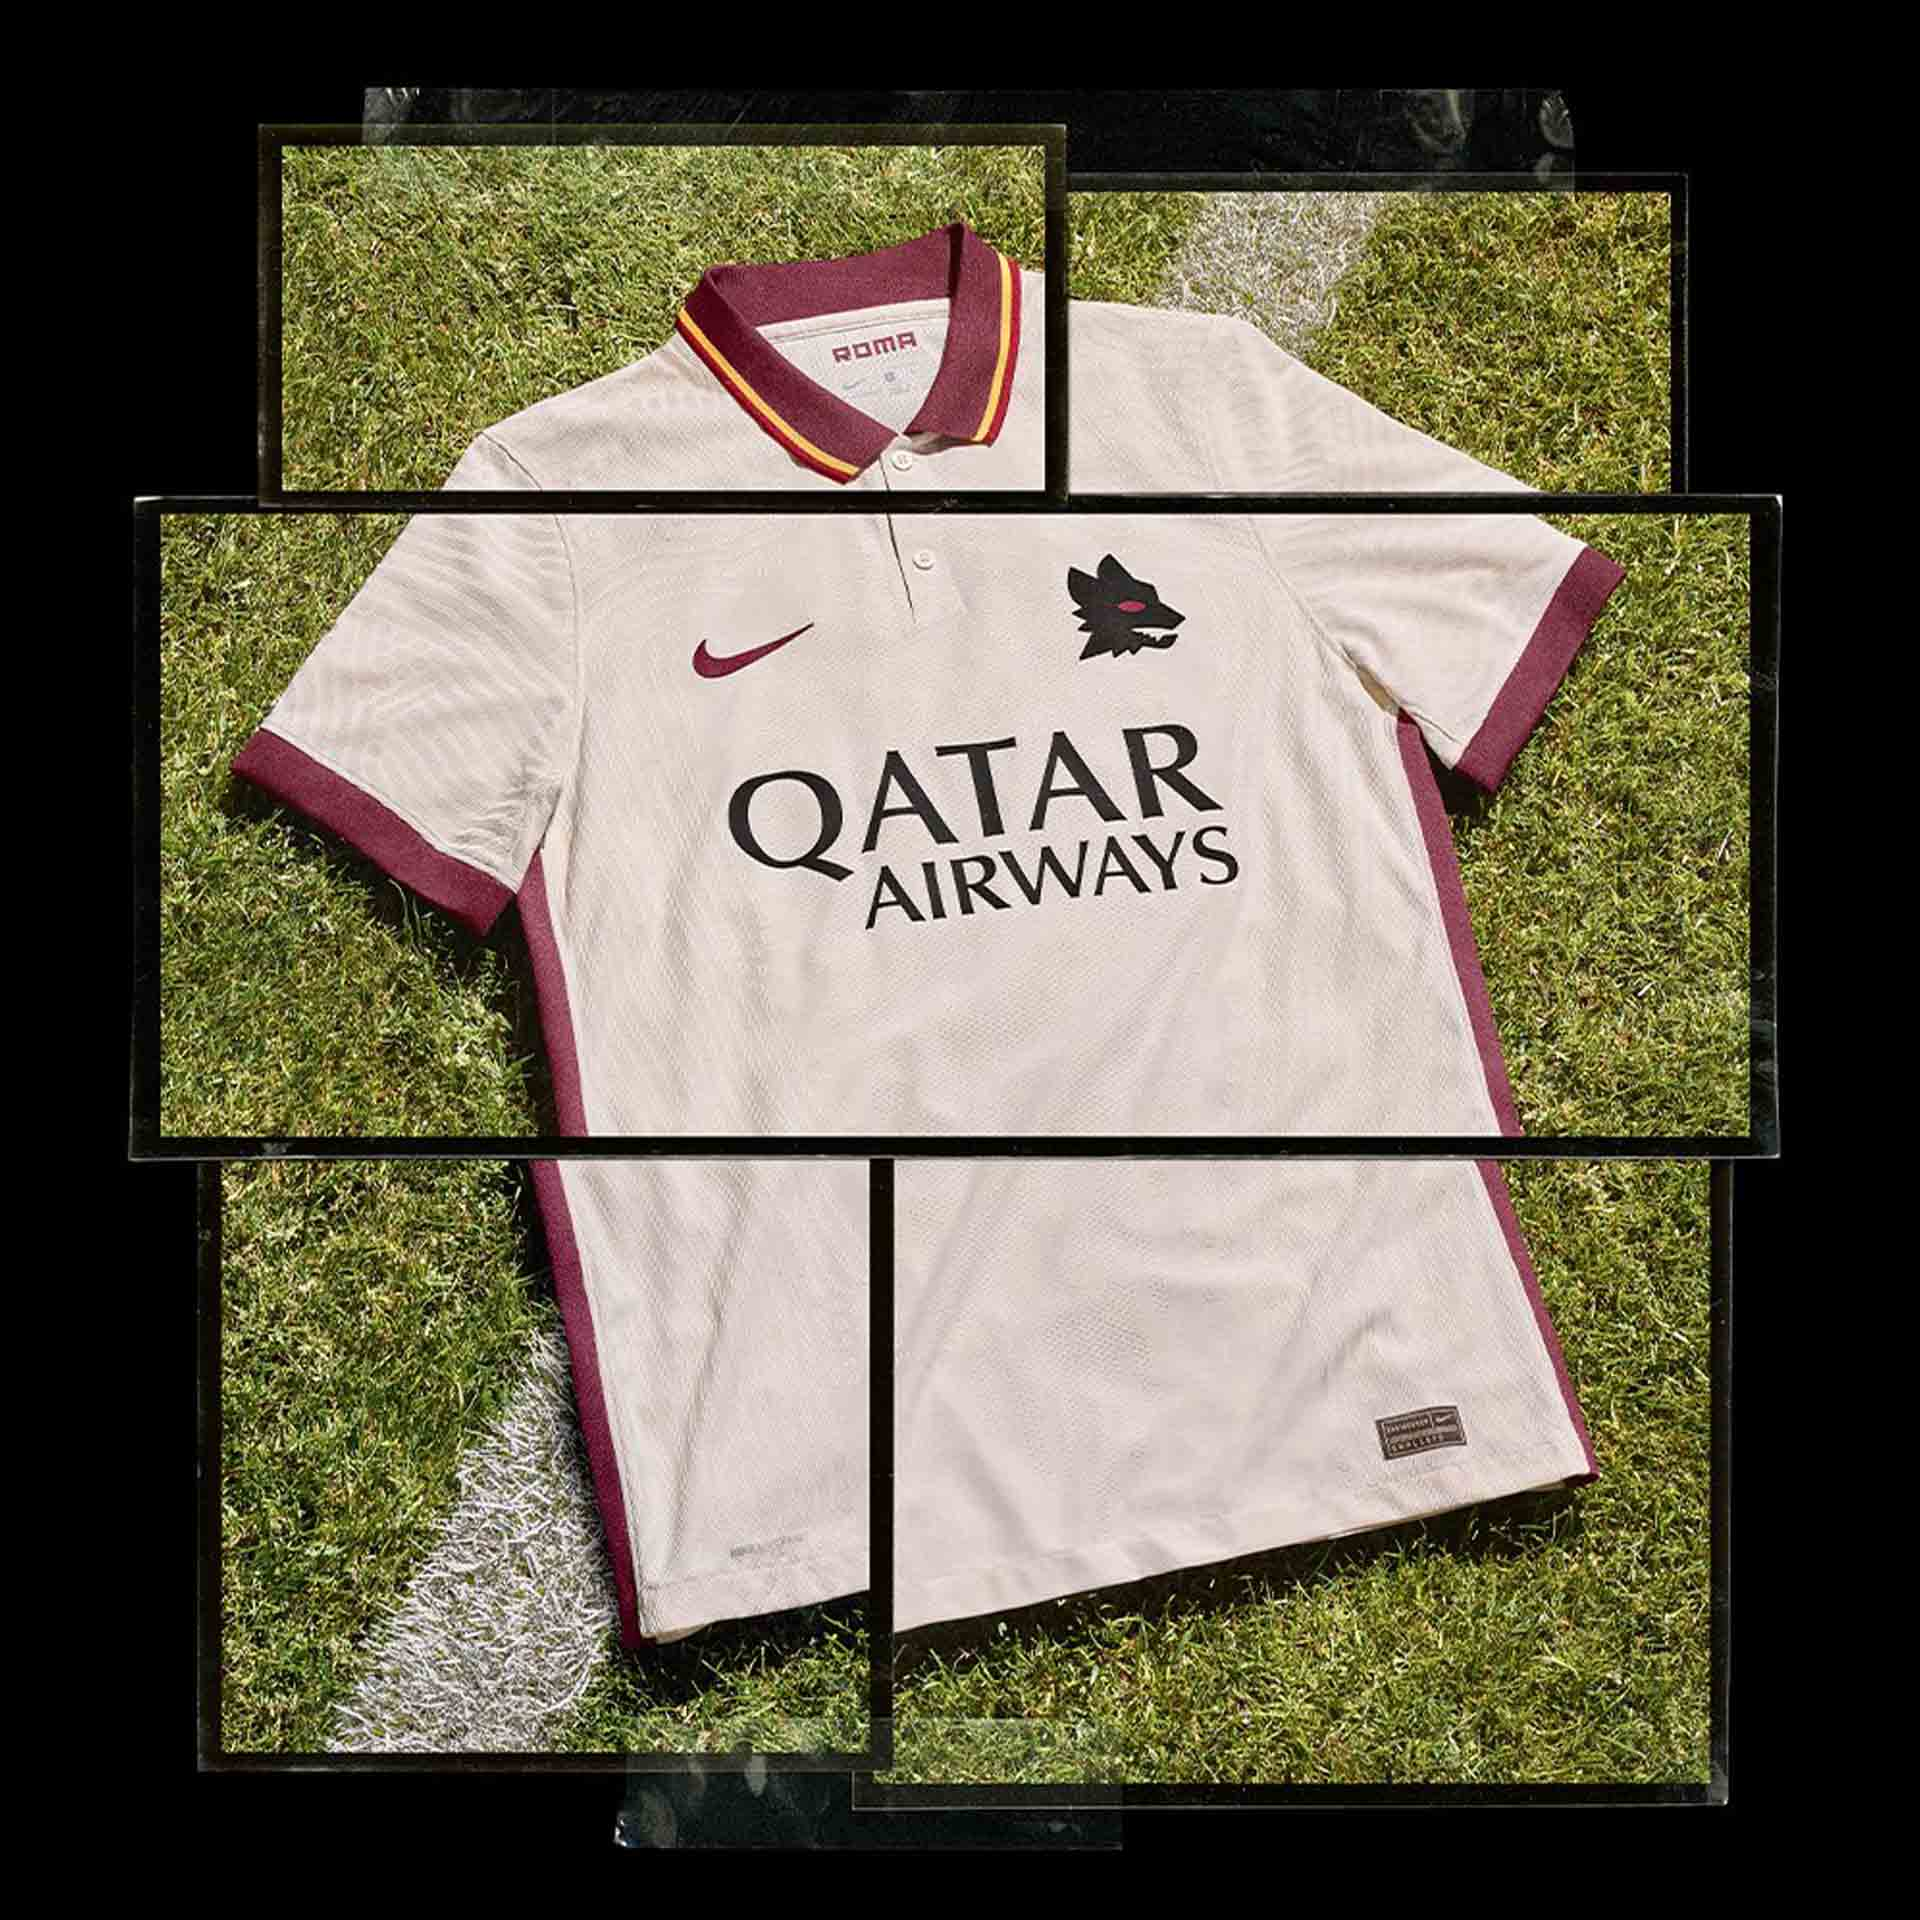 پیراهن دوم تیم فوتبال آ اس رم 2021